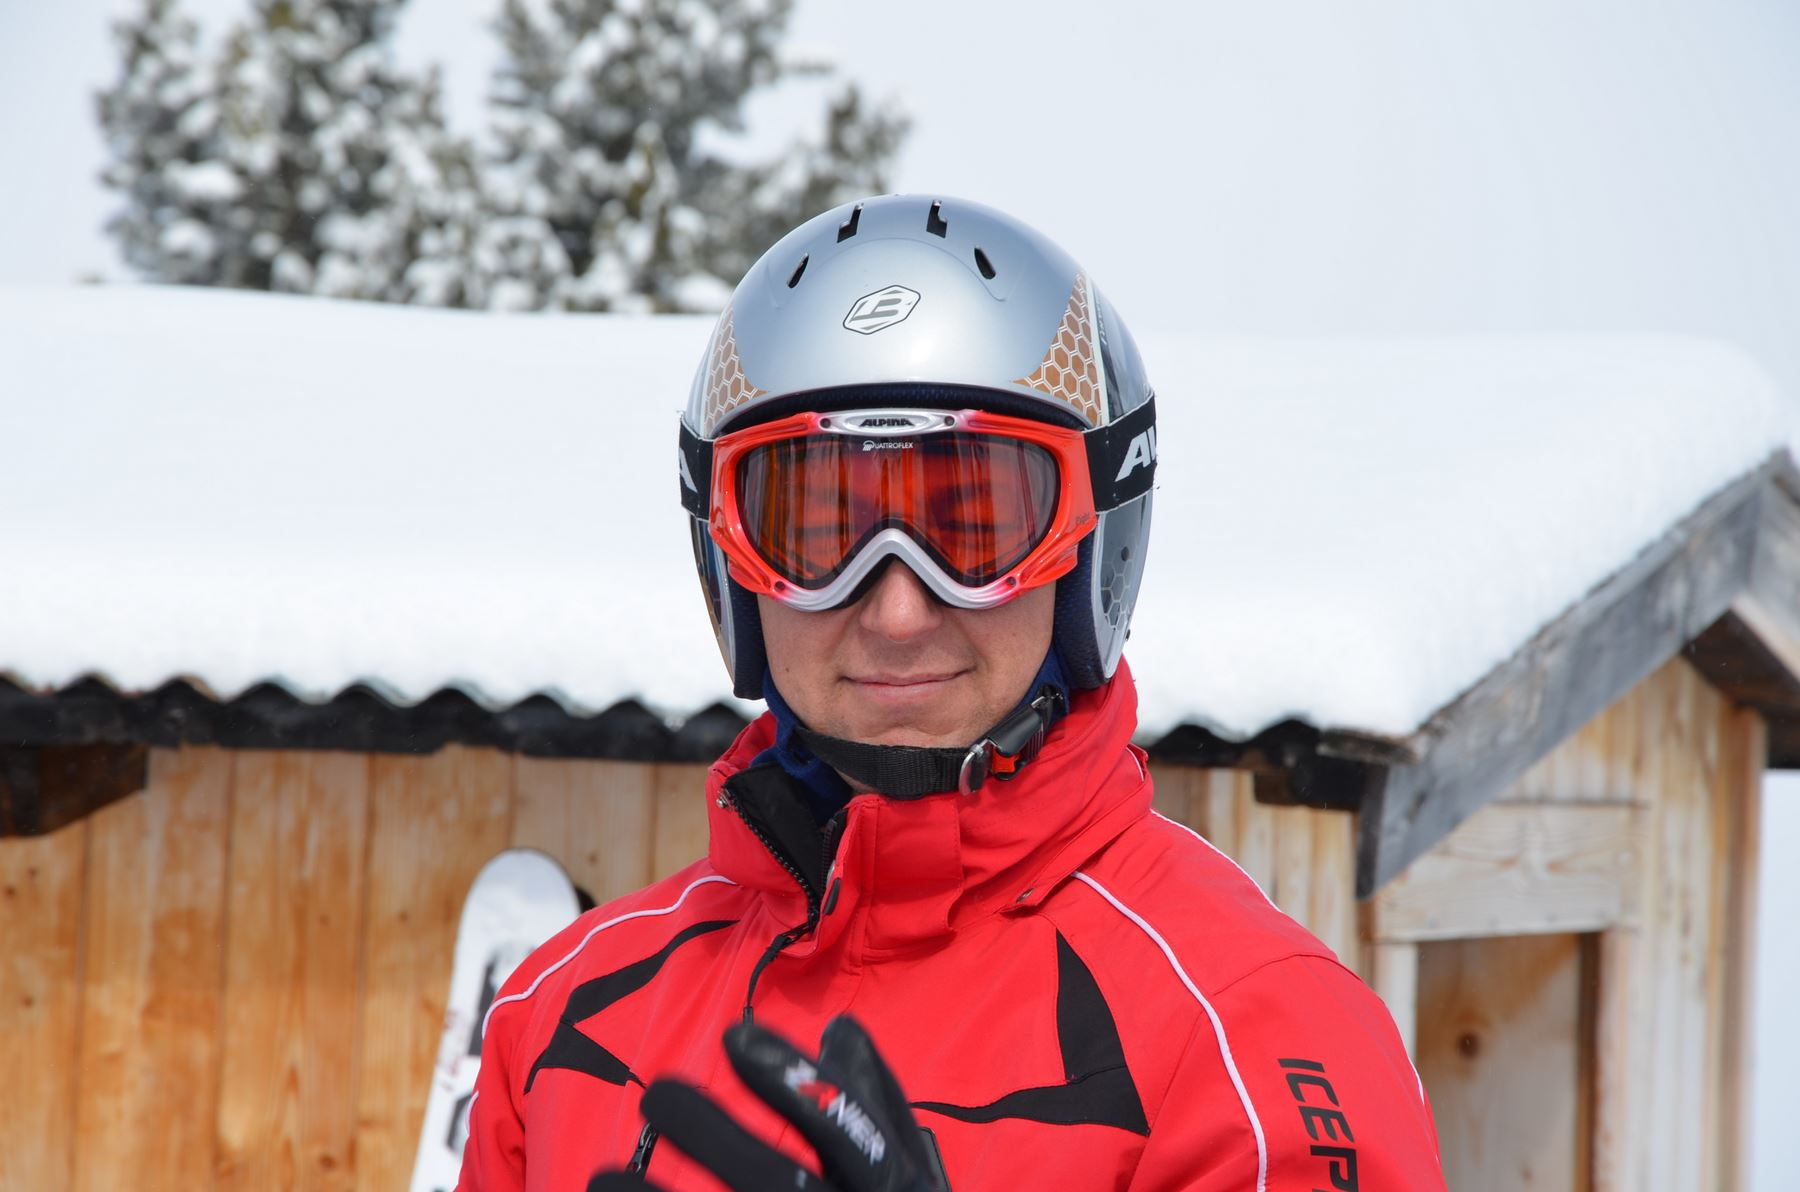 2015-03-22 BV Zillertal Skirennen 032.JPG